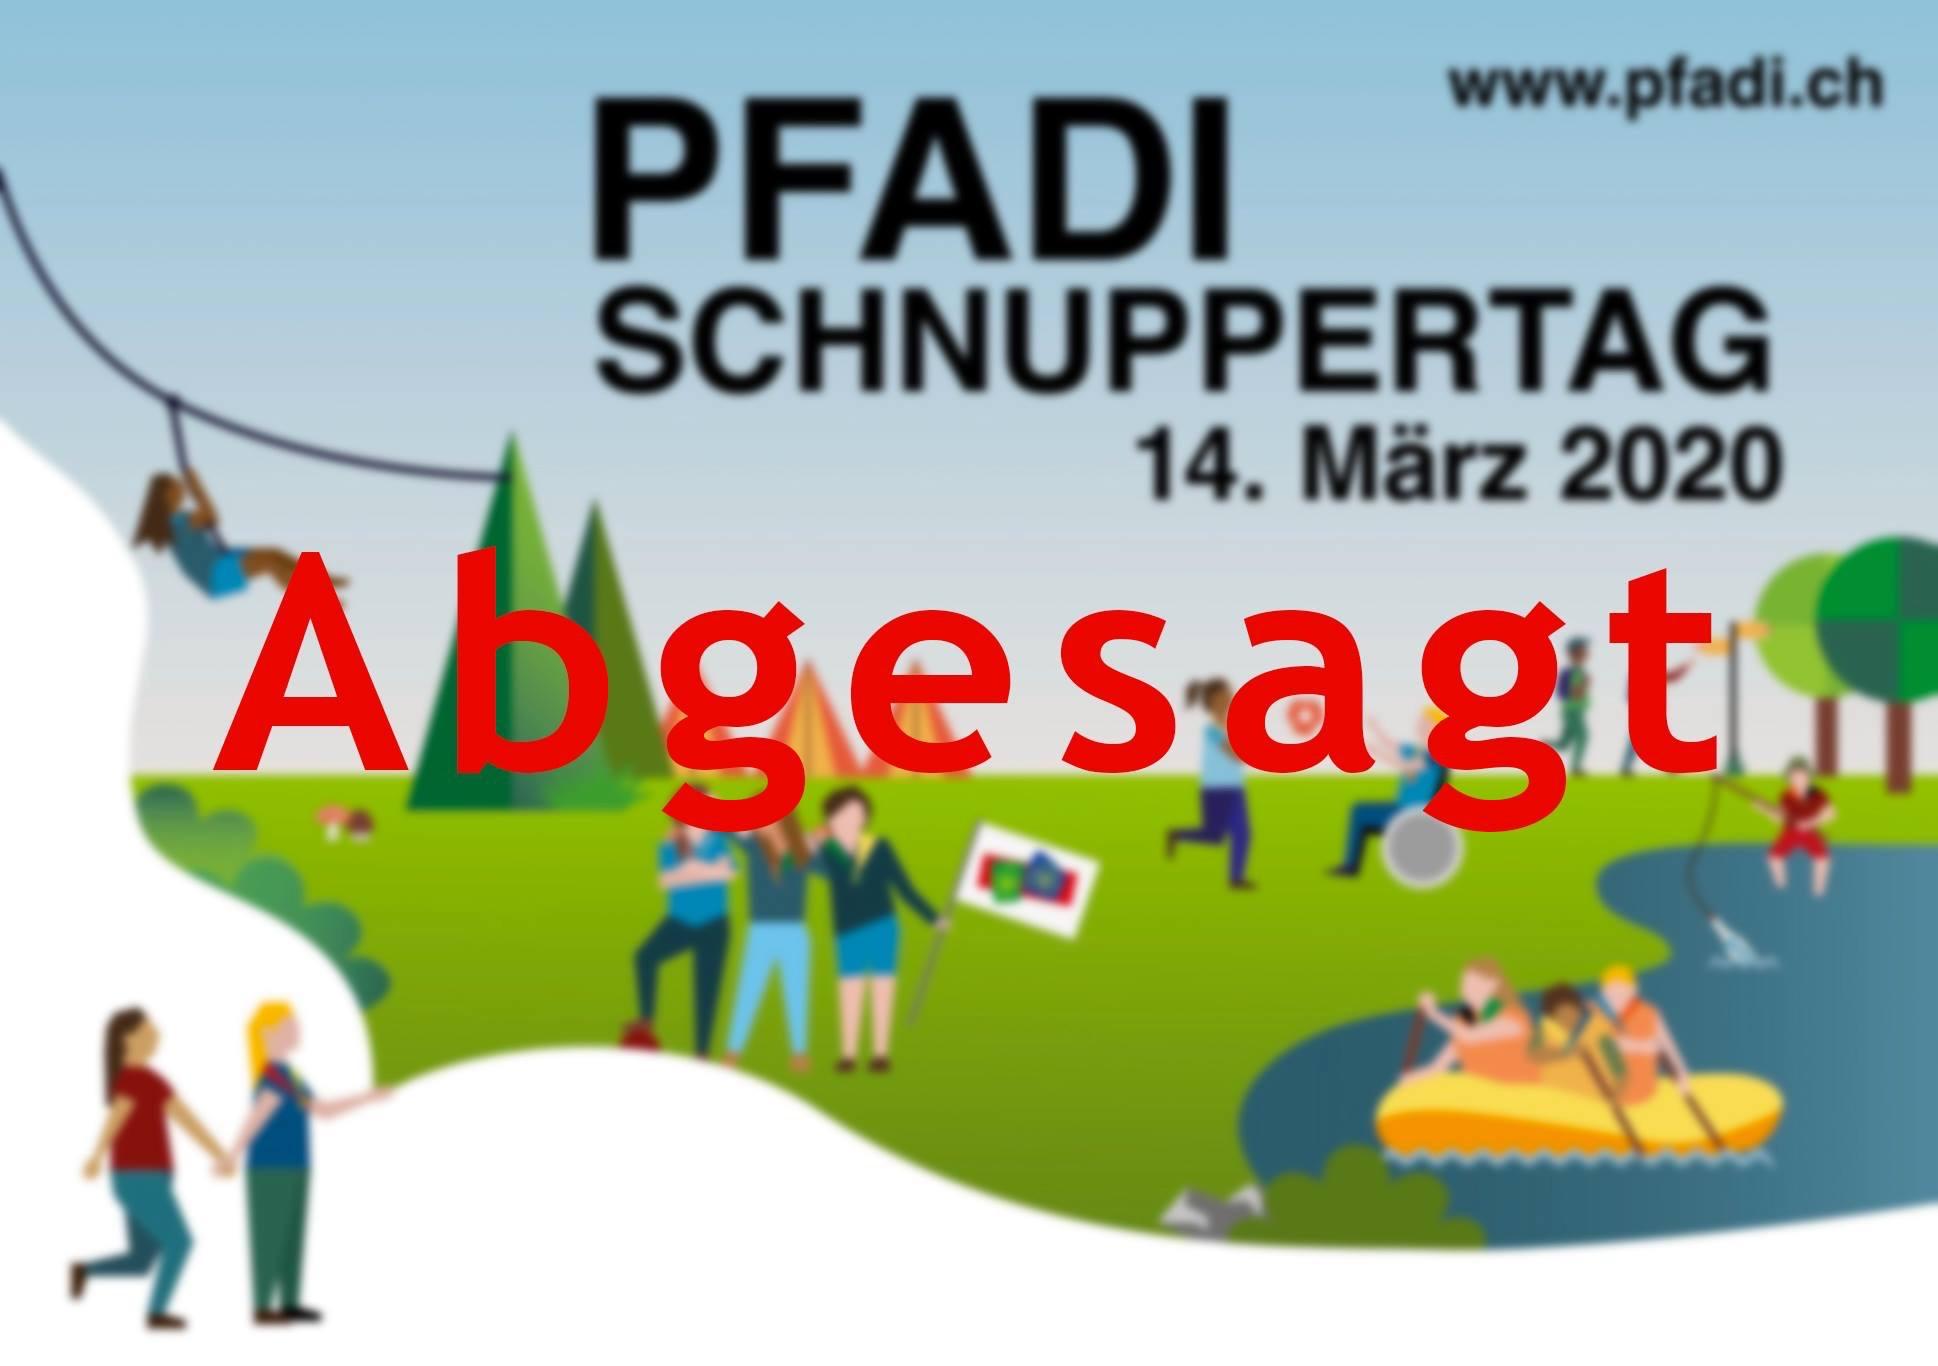 Schnuppertag Pfadi Schwyz 2020 ABGESAGT